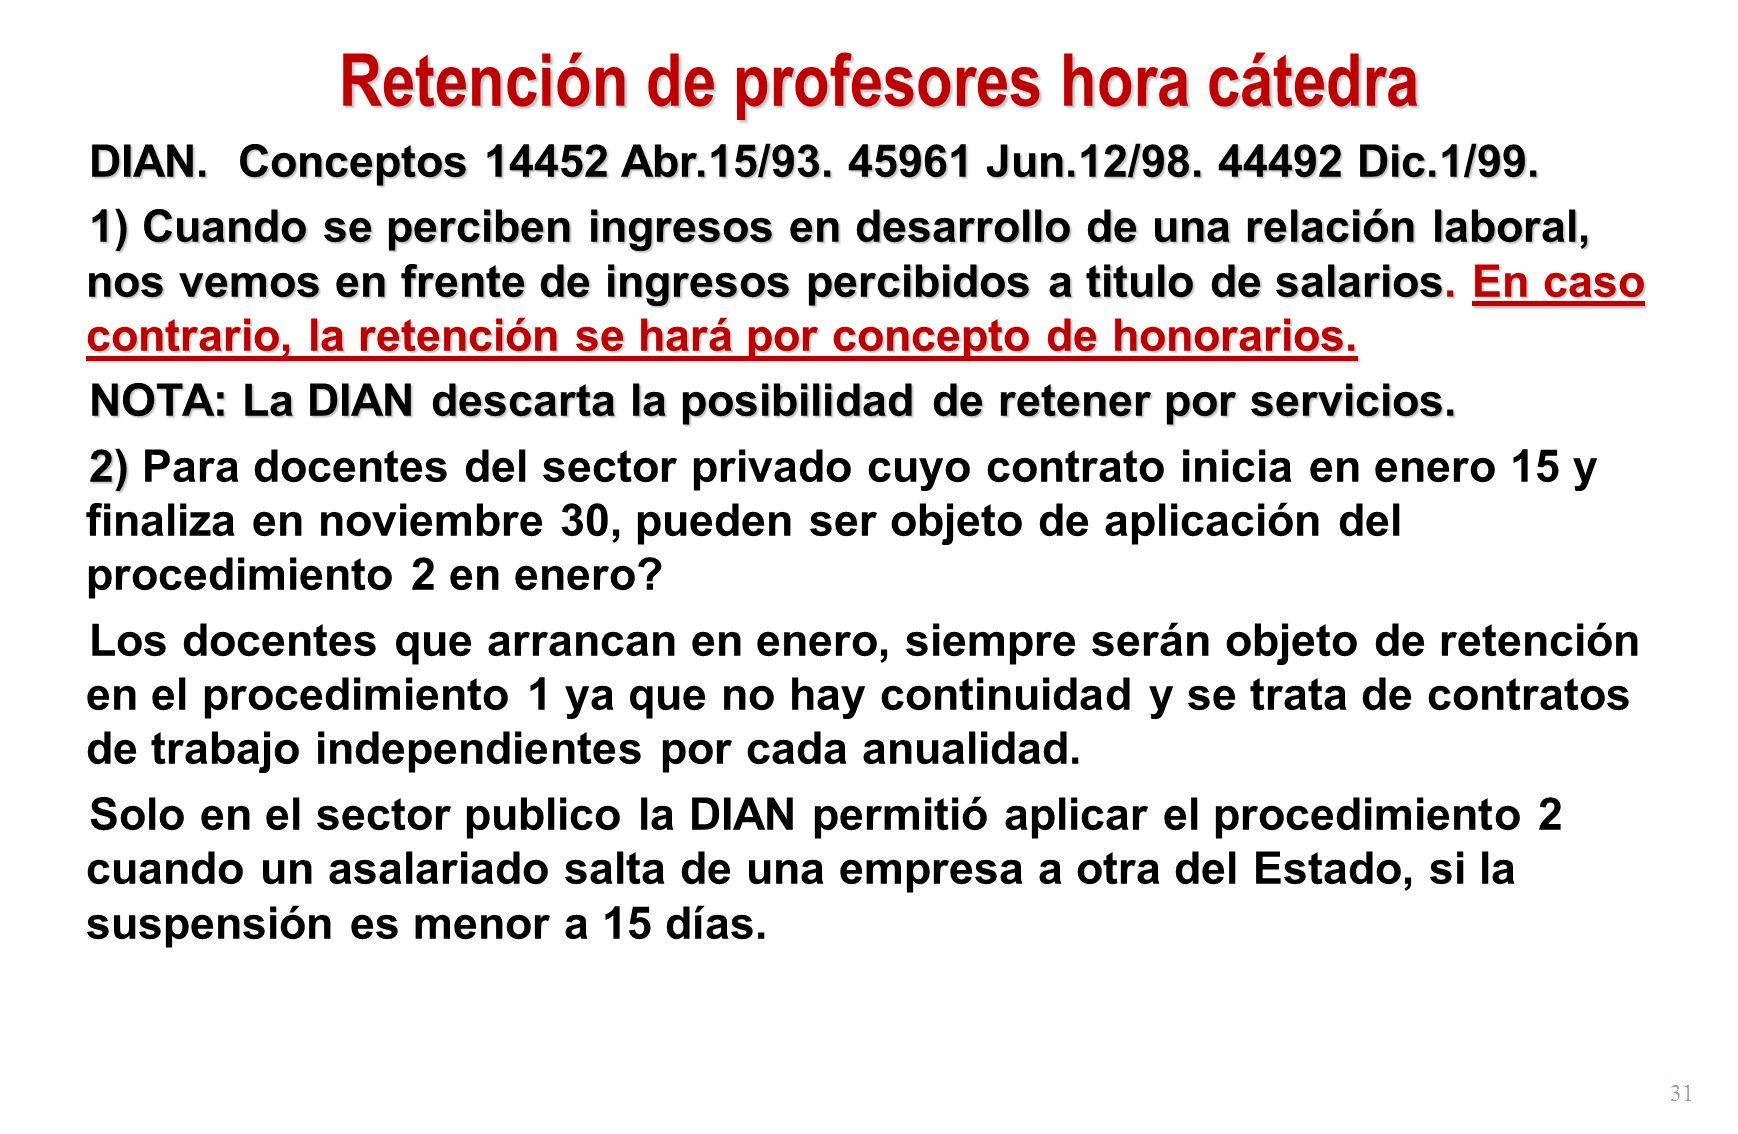 31 Retención de profesores hora cátedra DIAN. Conceptos 14452 Abr.15/93. 45961 Jun.12/98. 44492 Dic.1/99. 1) Cuando se perciben ingresos en desarrollo